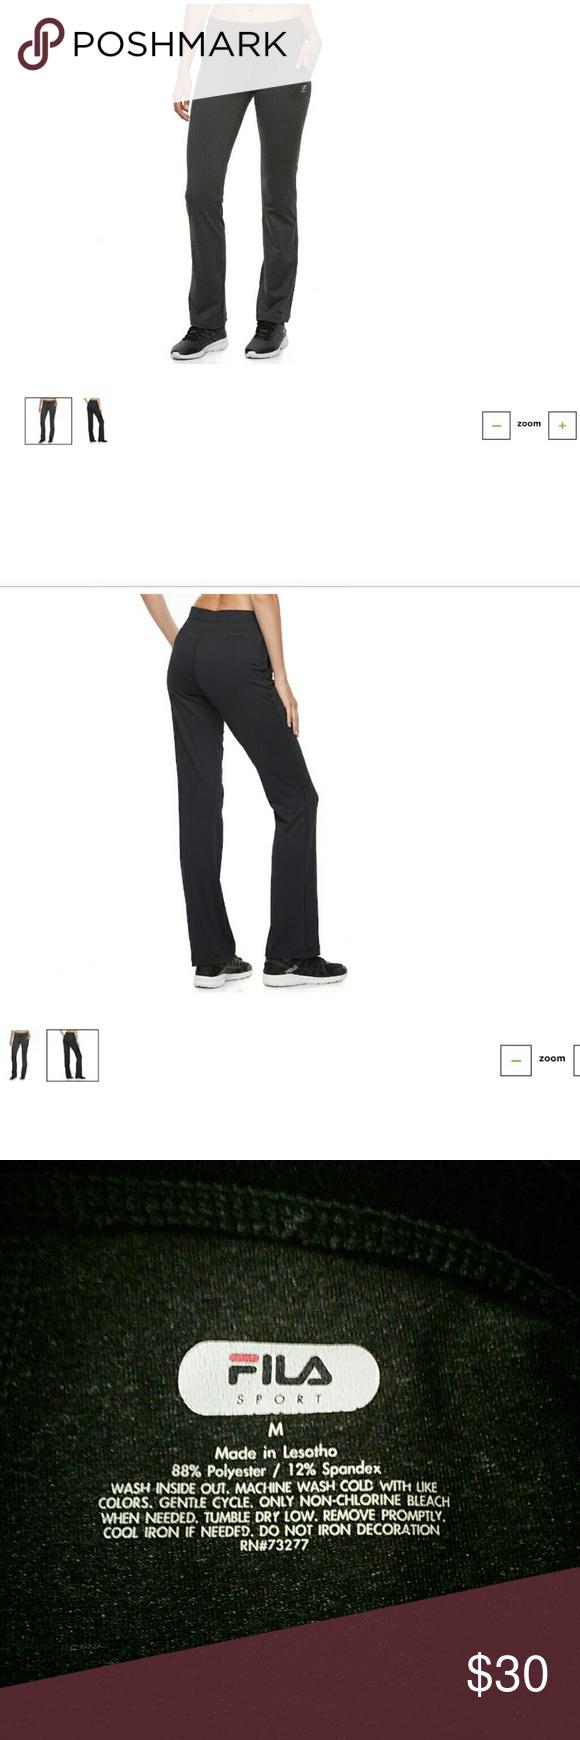 e8c1709290de5 Women's FILA SPORT Movement Straight-Leg Pants New! Never worn! Fila Pants  Straight Leg